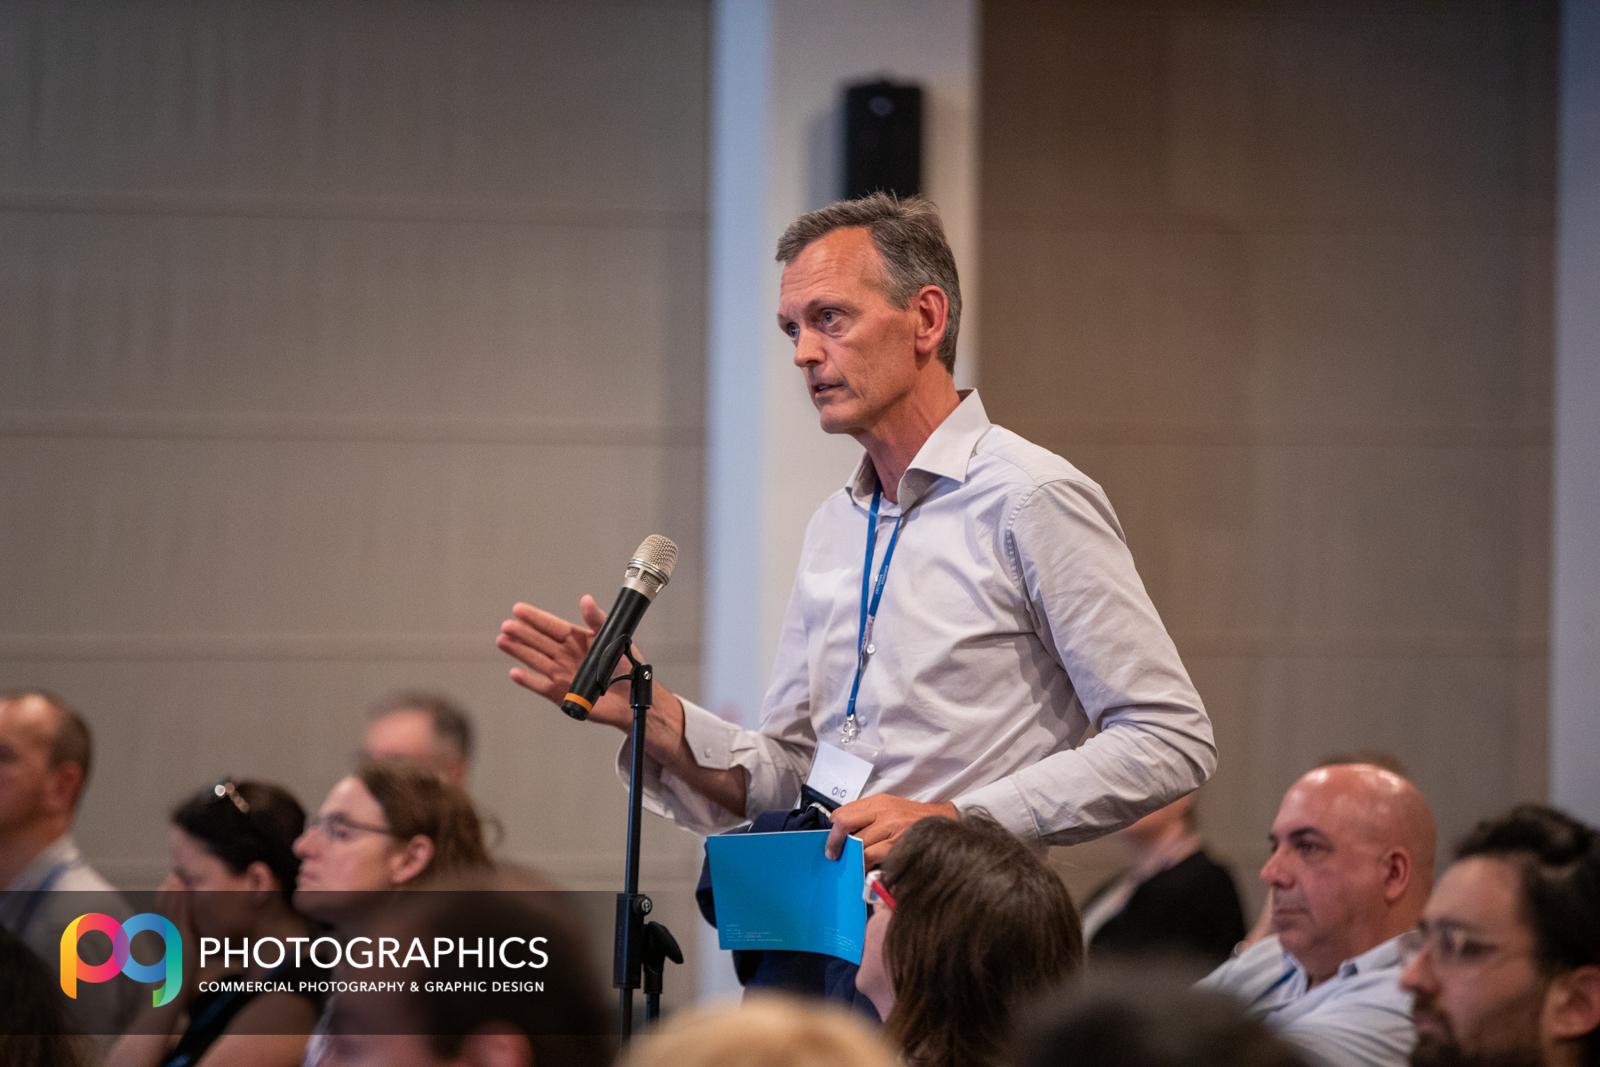 Conference-photography-edinburgh-glasgow-croatia-8.jpg